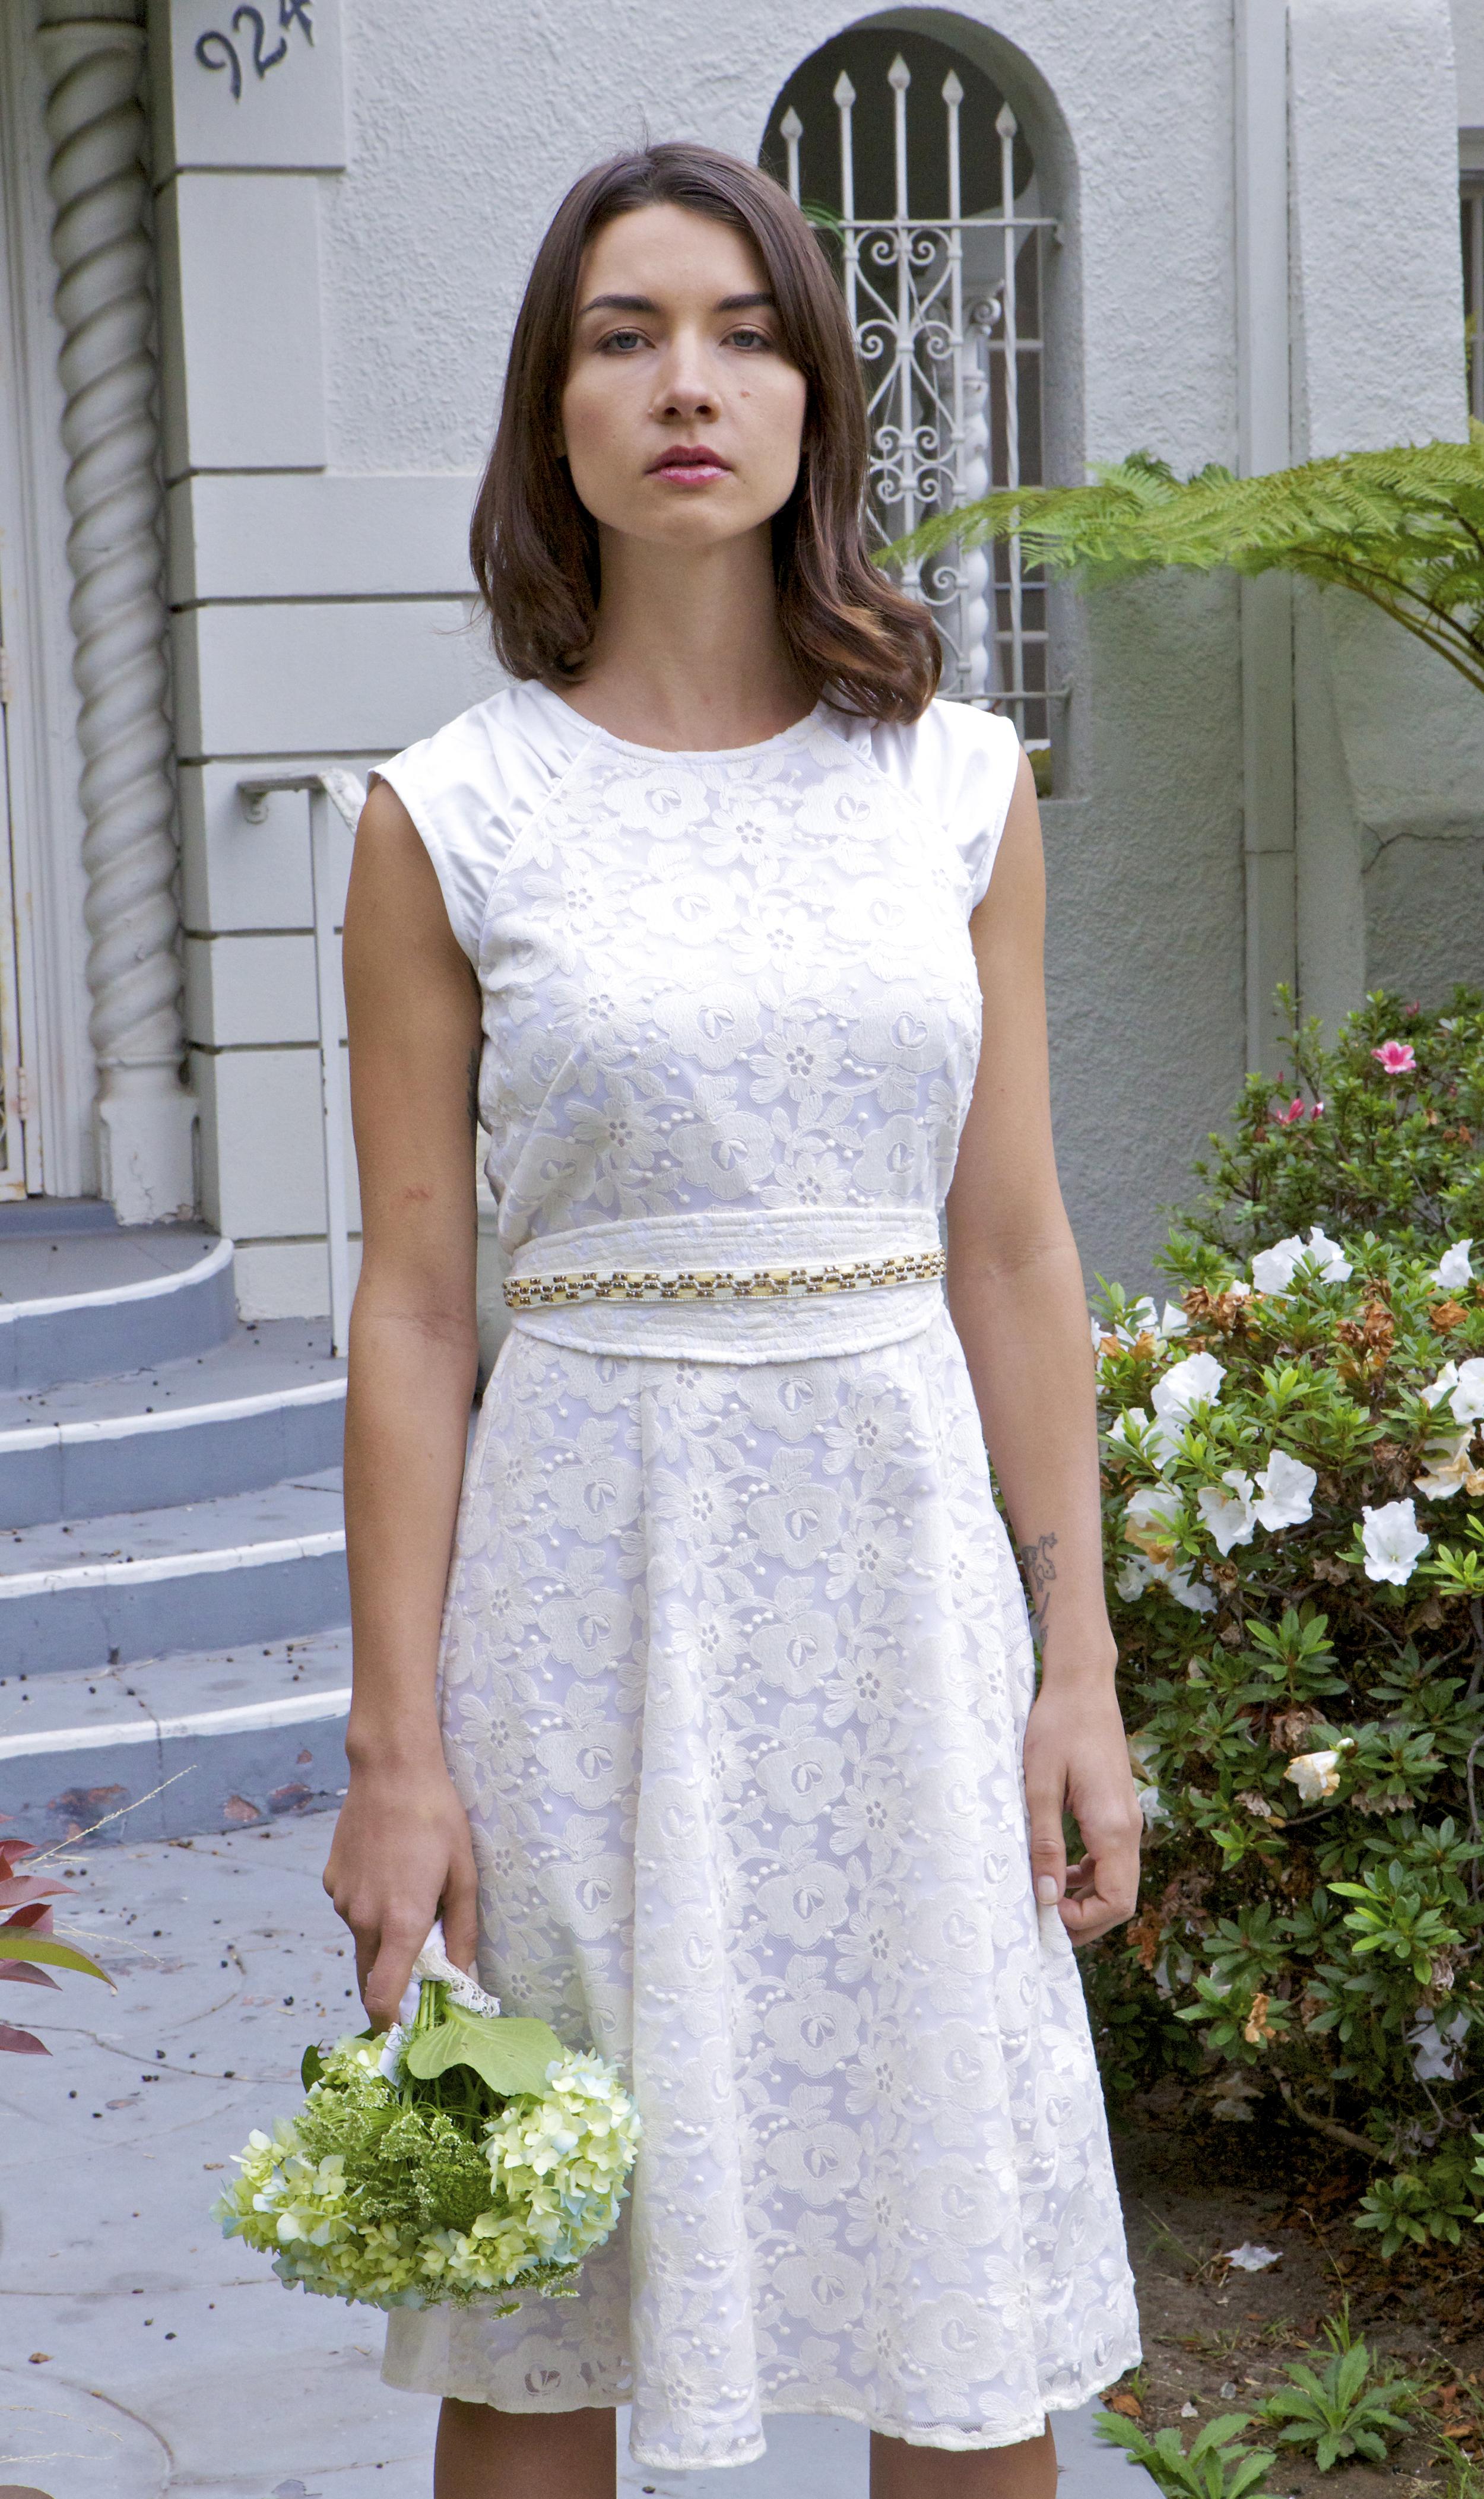 Retro 50's style wedding midi dress with beaded obi belt